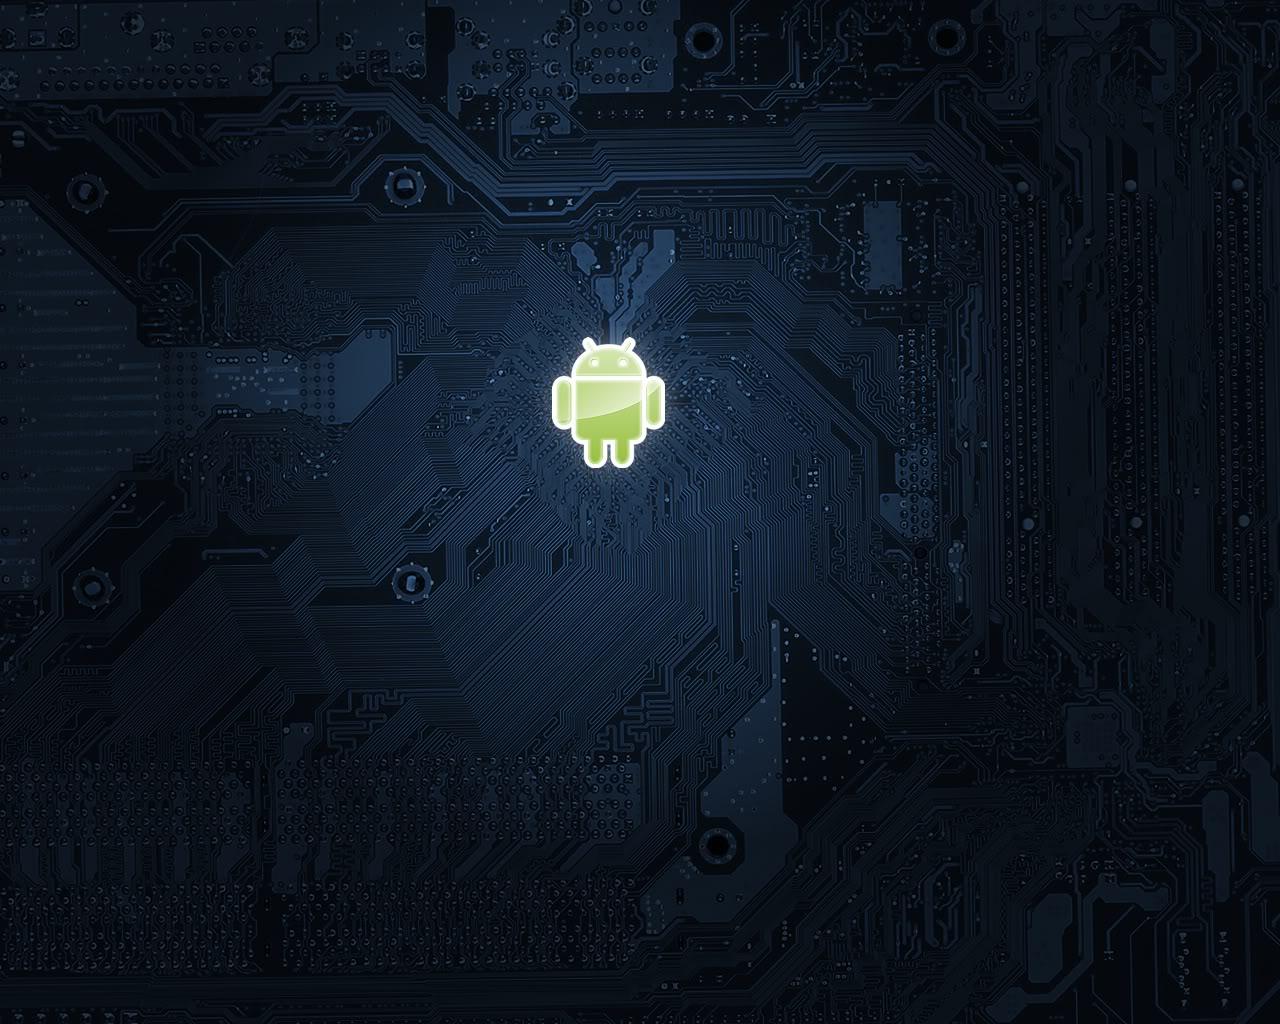 http://2.bp.blogspot.com/-G7itAsiP8ZI/TmTDbcgHPuI/AAAAAAAAAiA/cnq4IxTtnkQ/s1600/Android-Wallpapers-3.jpg